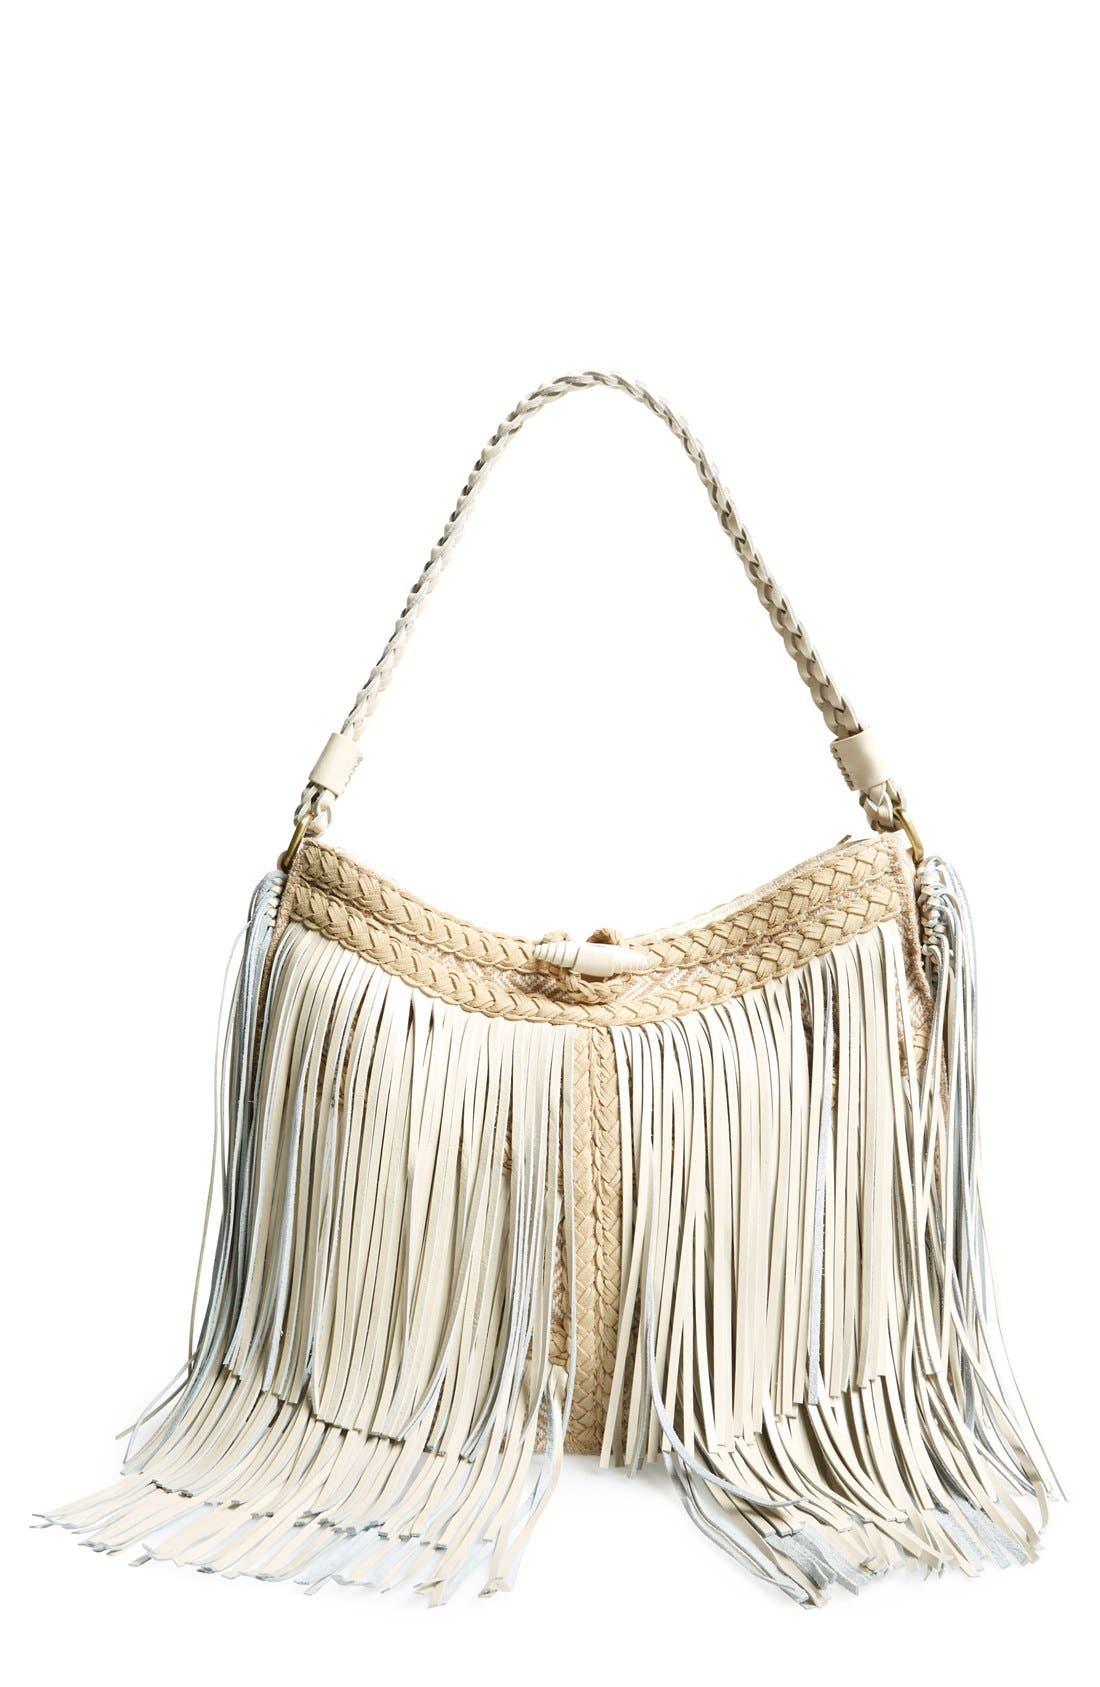 Alternate Image 1 Selected - Sam Edelman 'Sienna' Bag